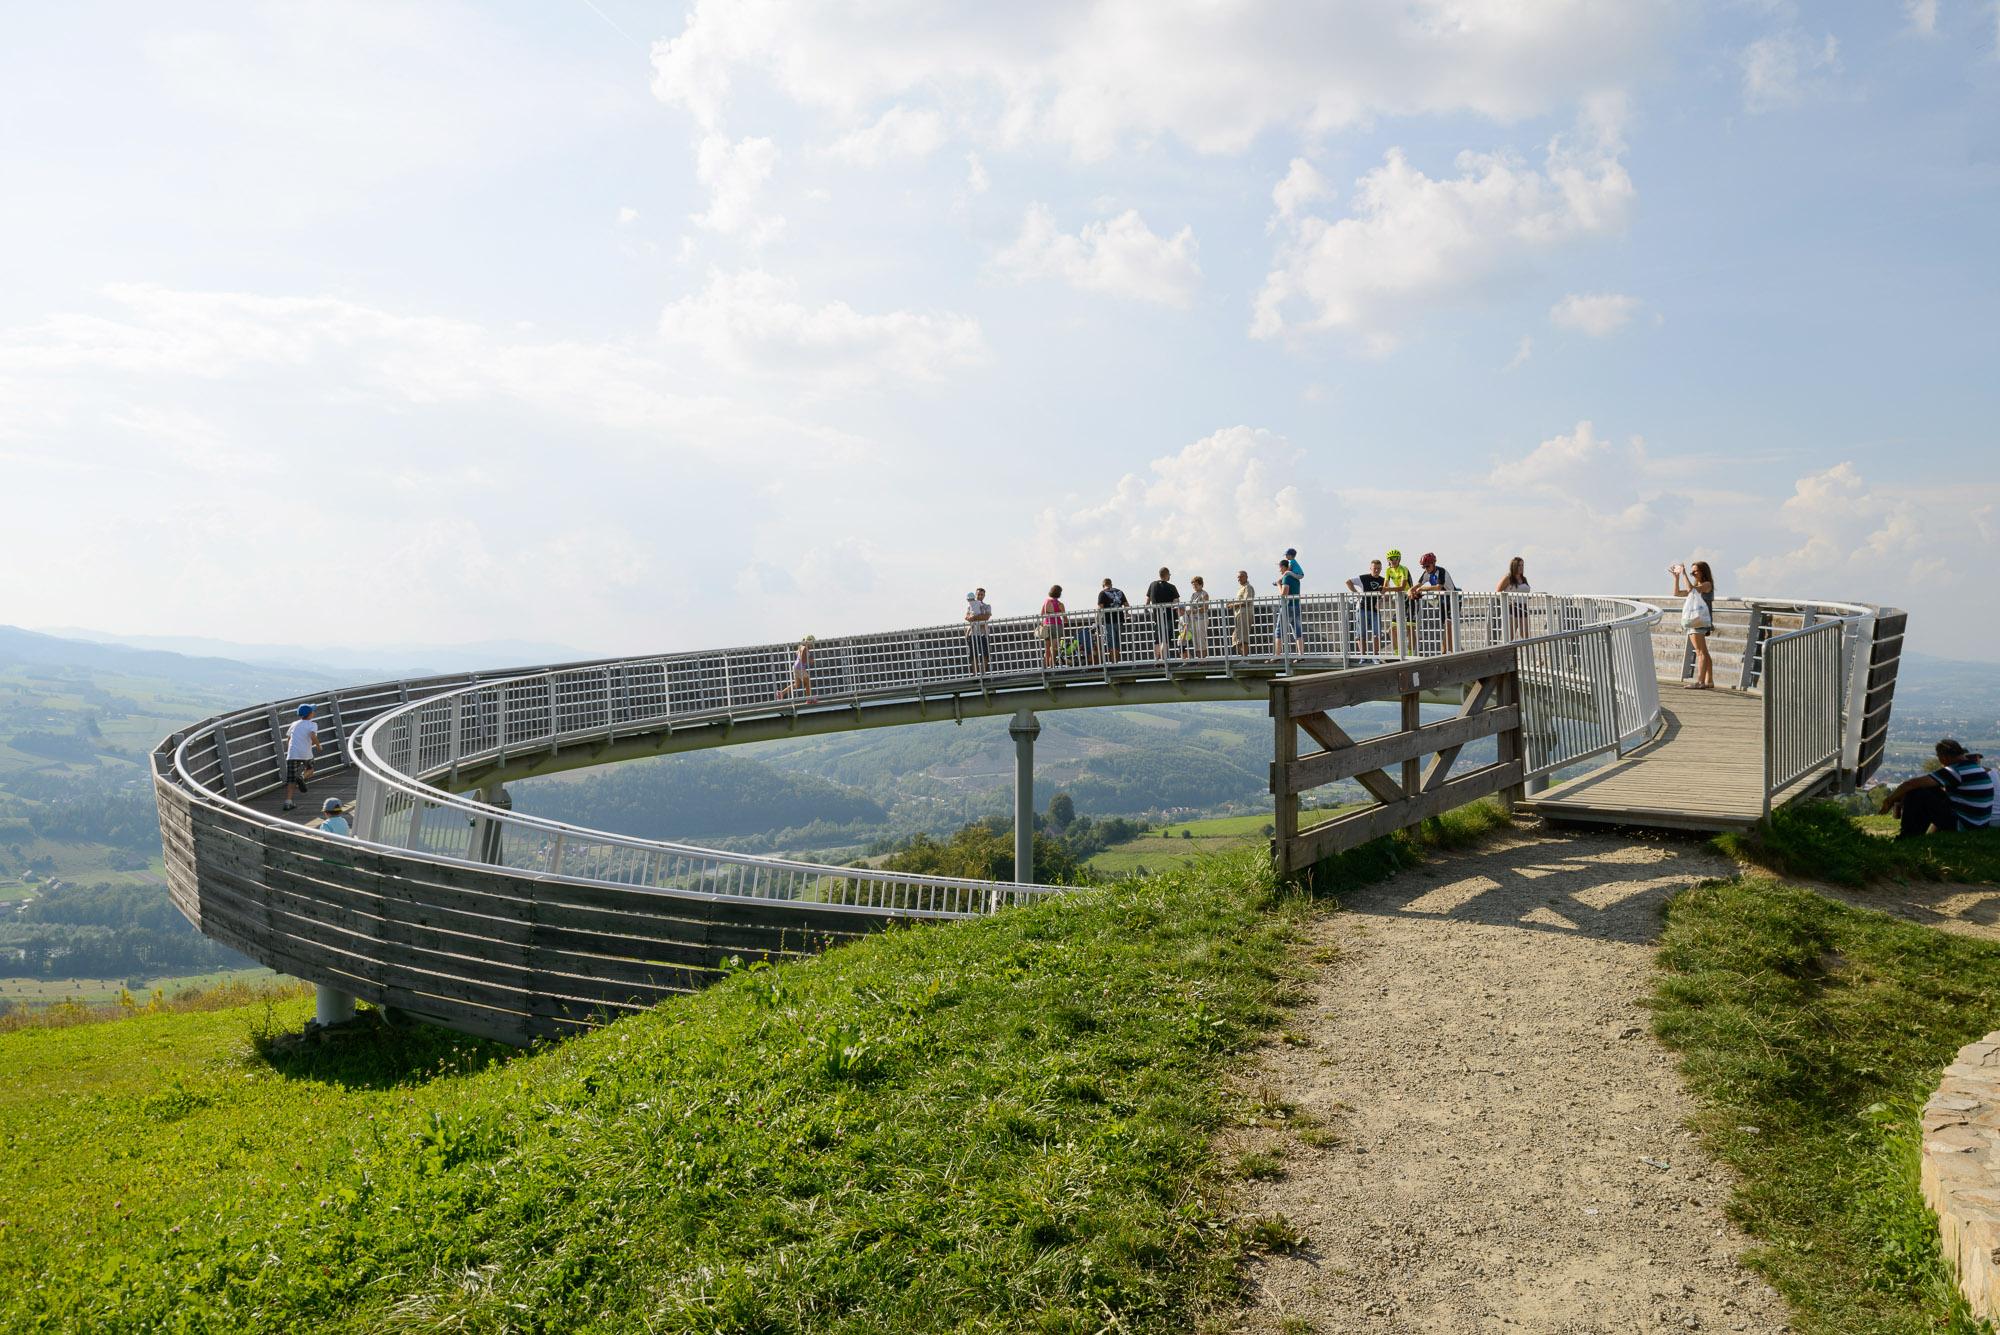 Platforma widokowa w Woli Kroguleckiej